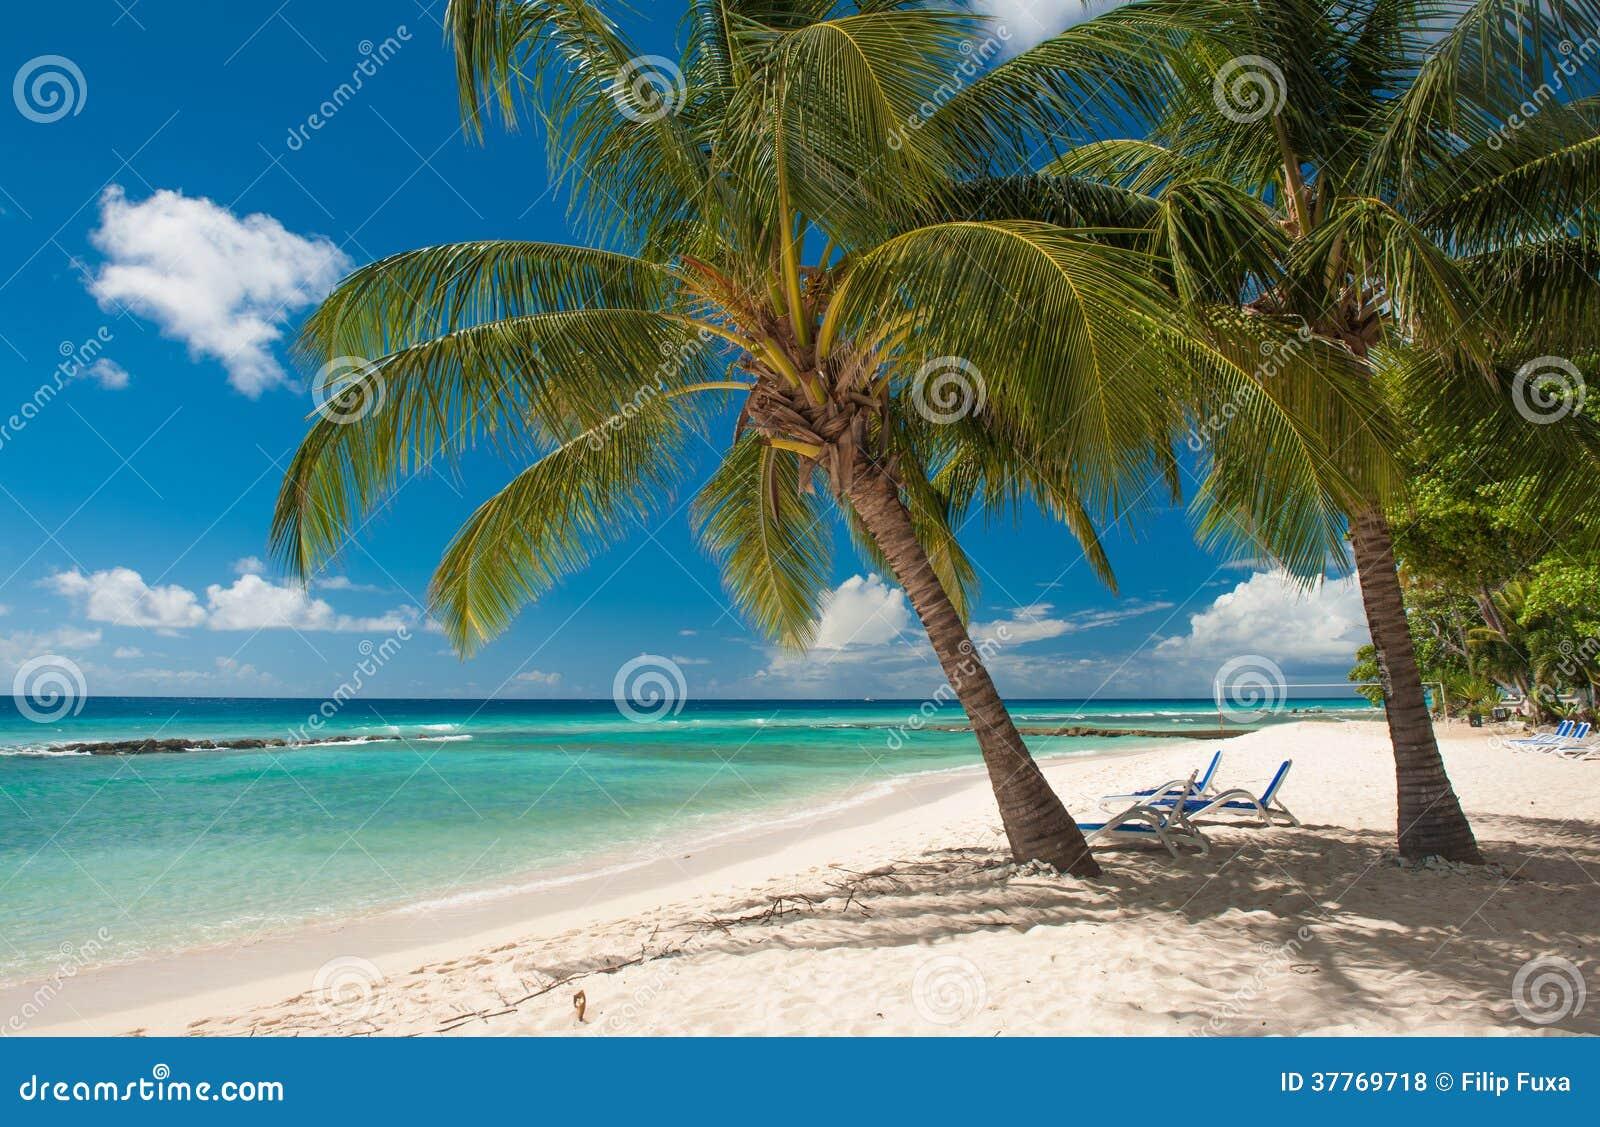 Tropical Island Beach Ambience Sound: Barbados Stock Photo. Image Of Barbados, Nature, Seascape